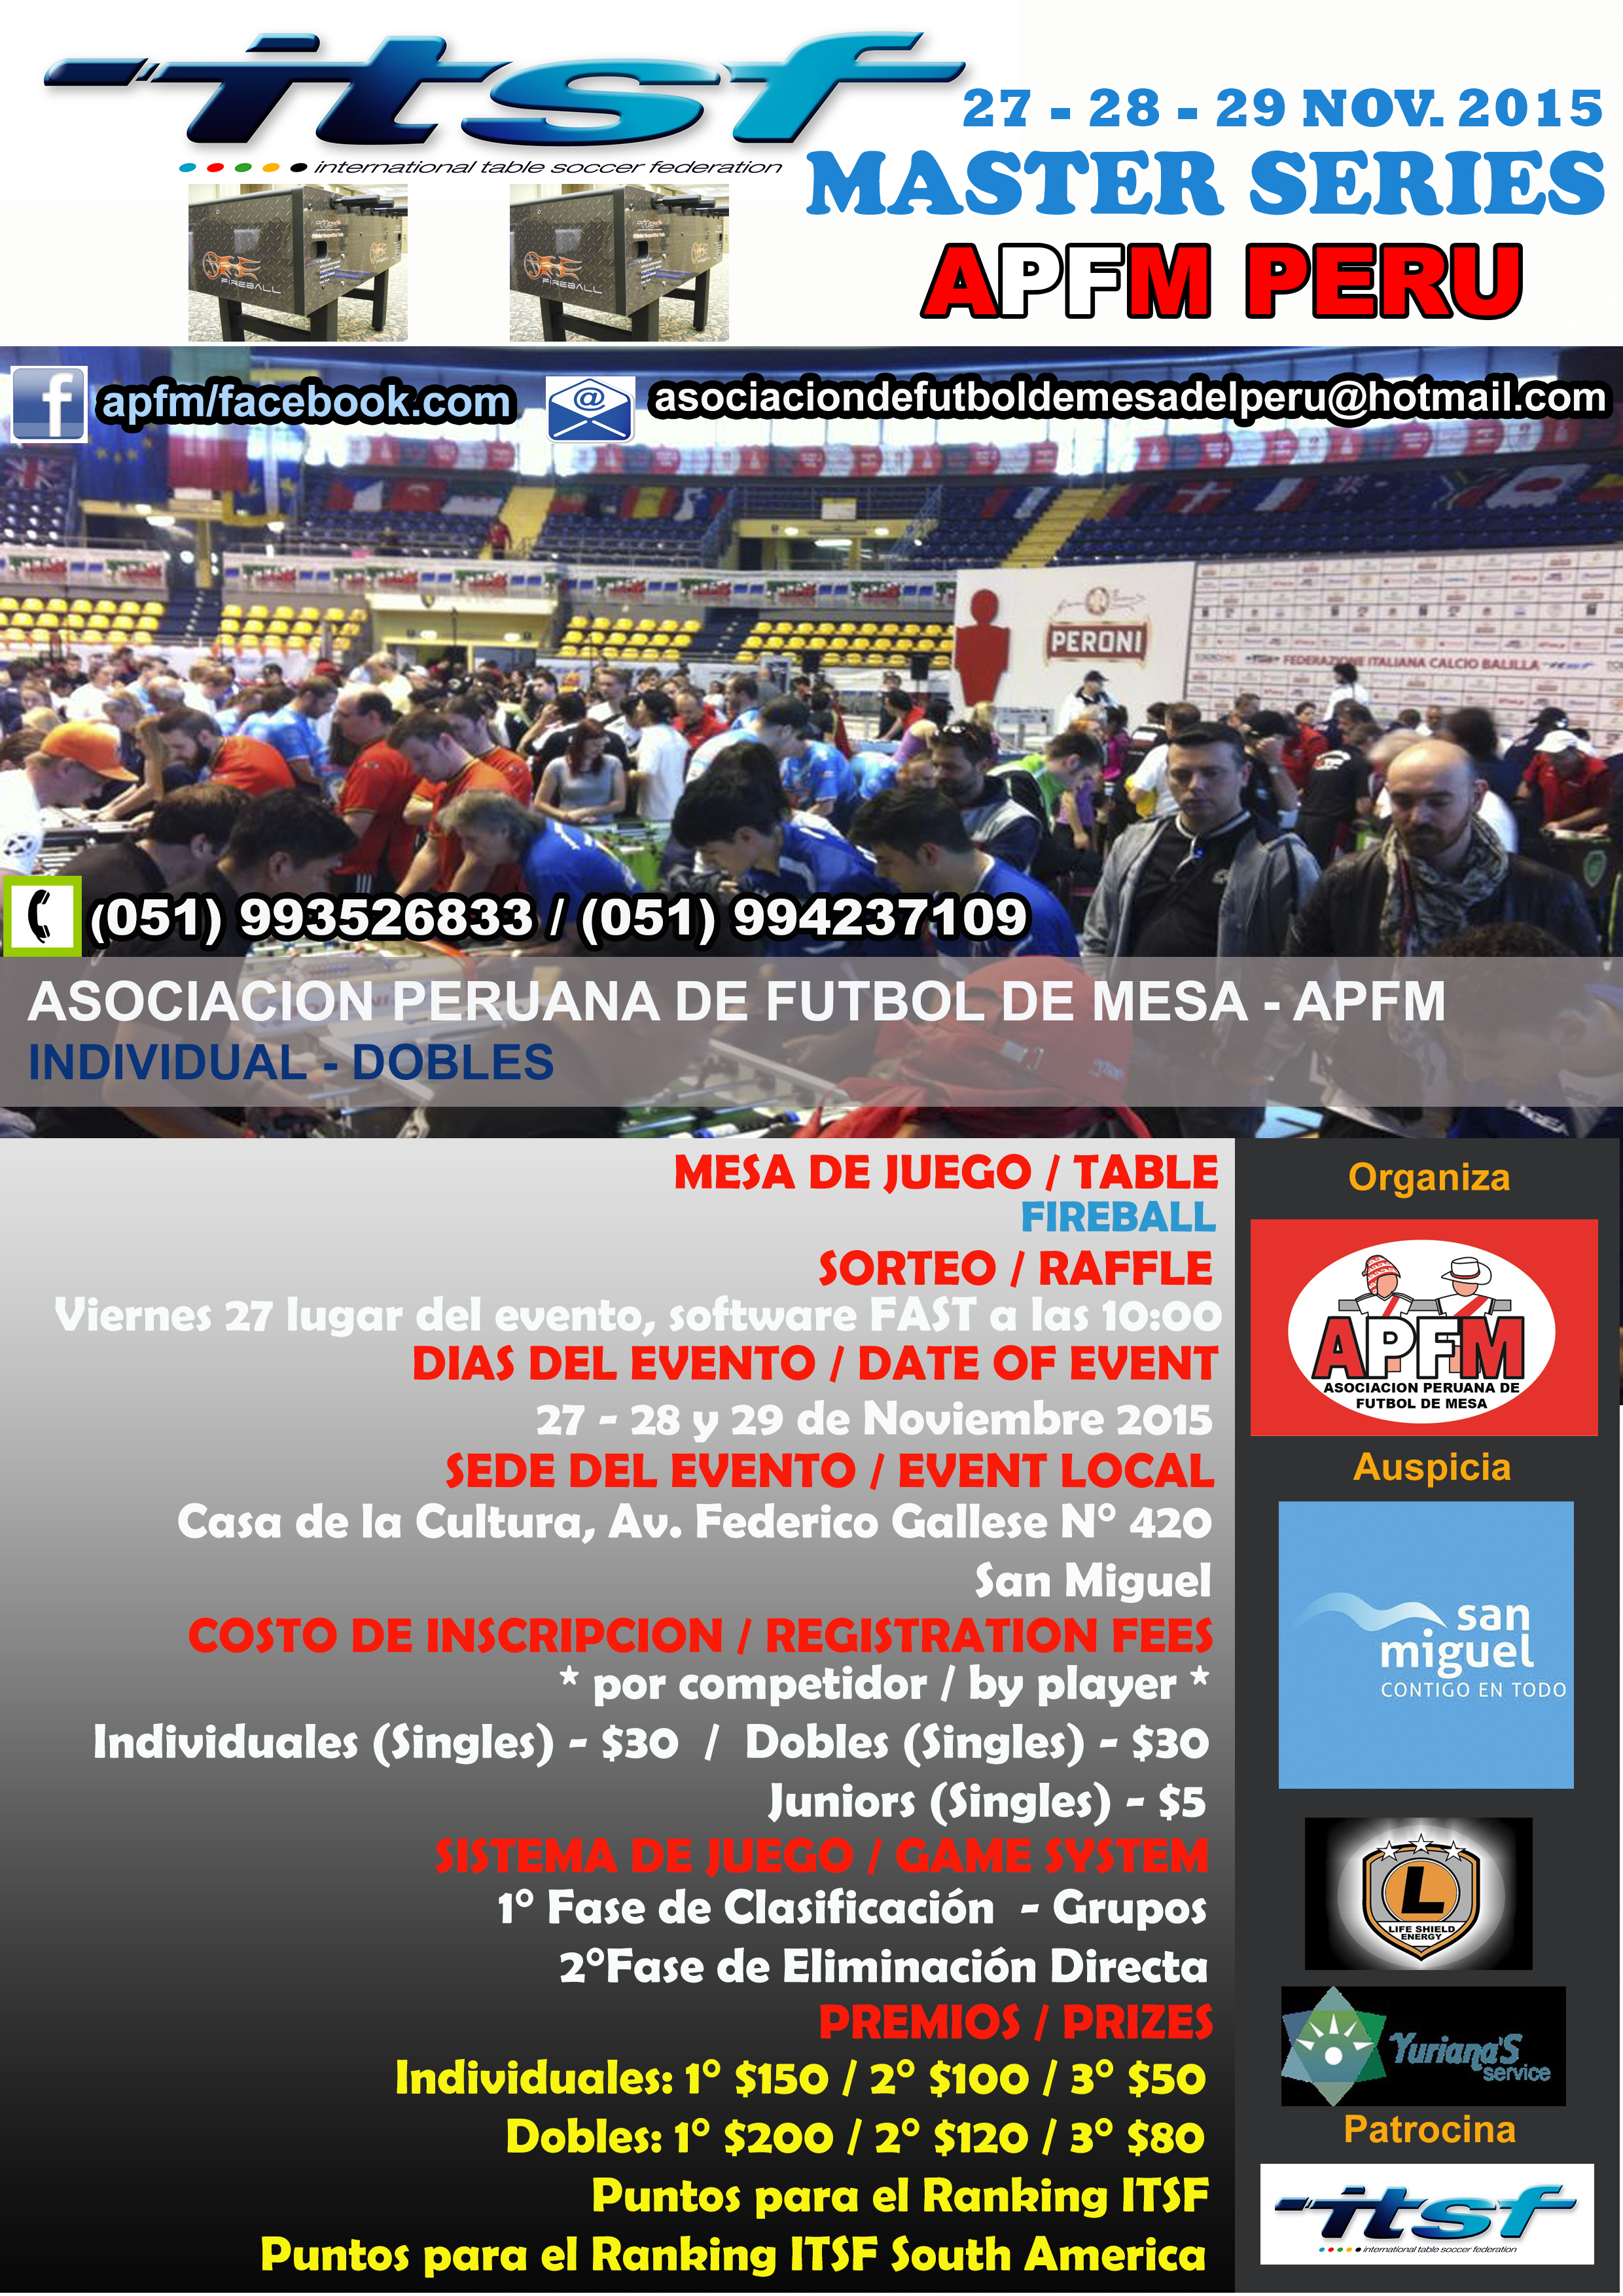 Leonhart Foosball Table Master Series APFM Peru 2015 | International Table Soccer Federation